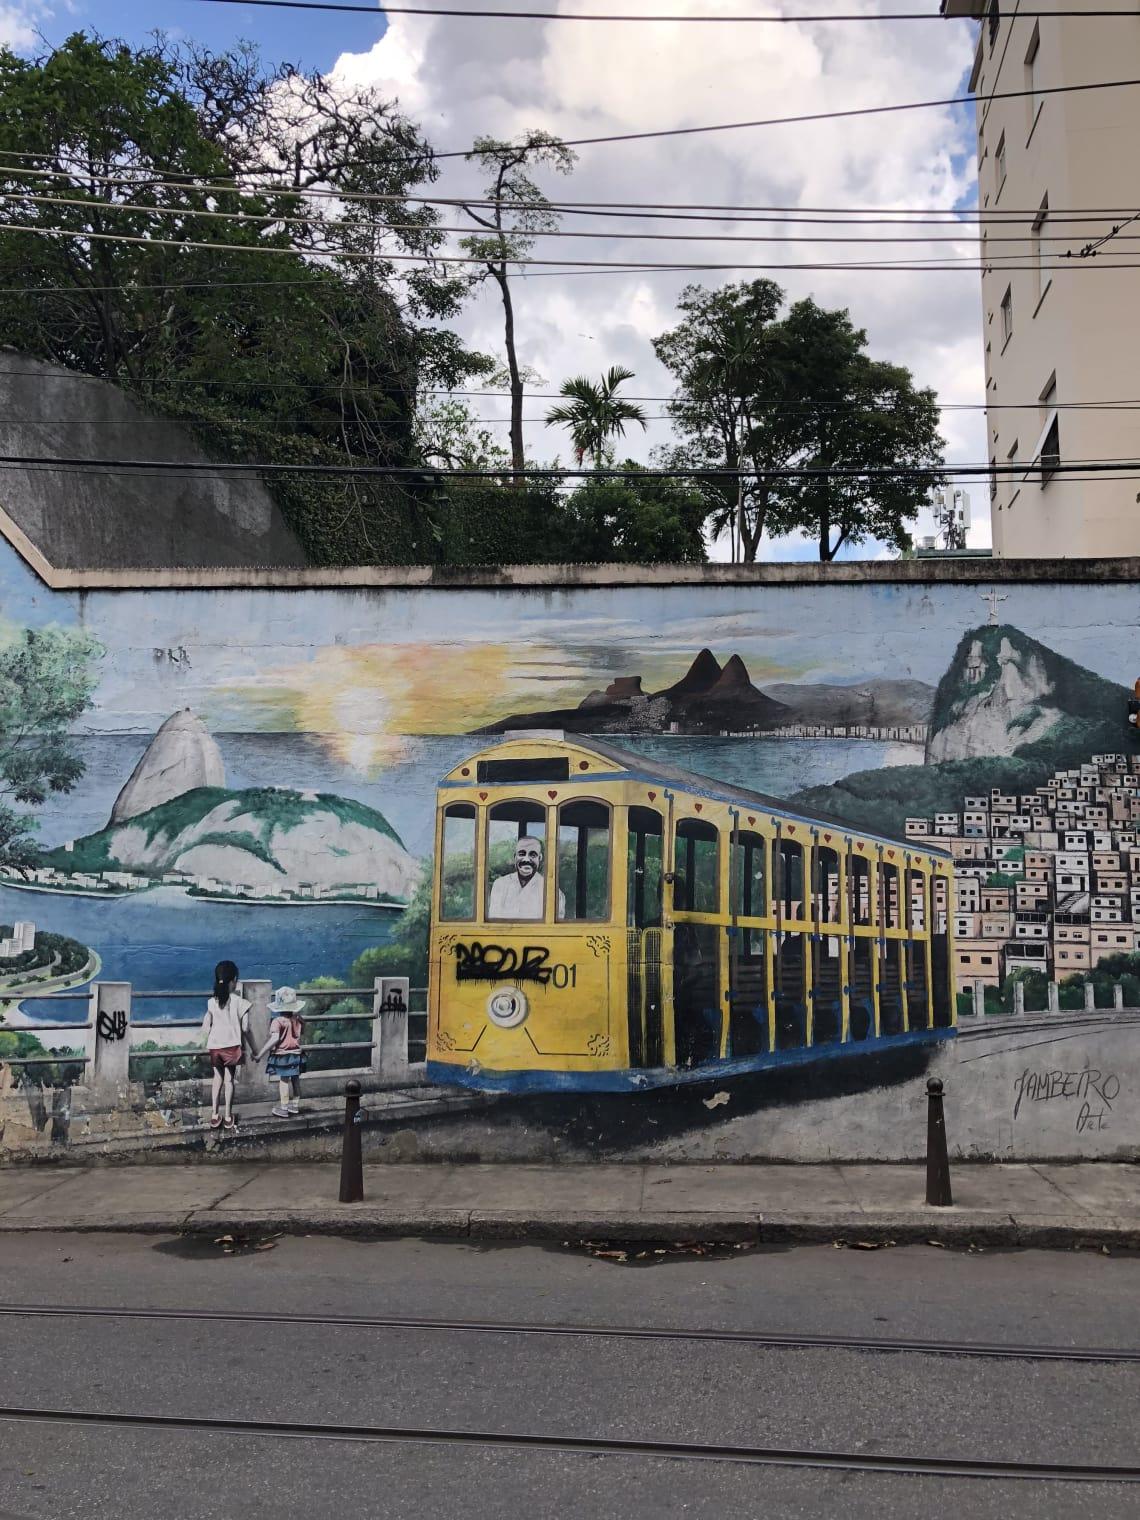 Guía para viajar a Río de Janeiro - Santa Teresa -Brasilvivientes - Worldpackers